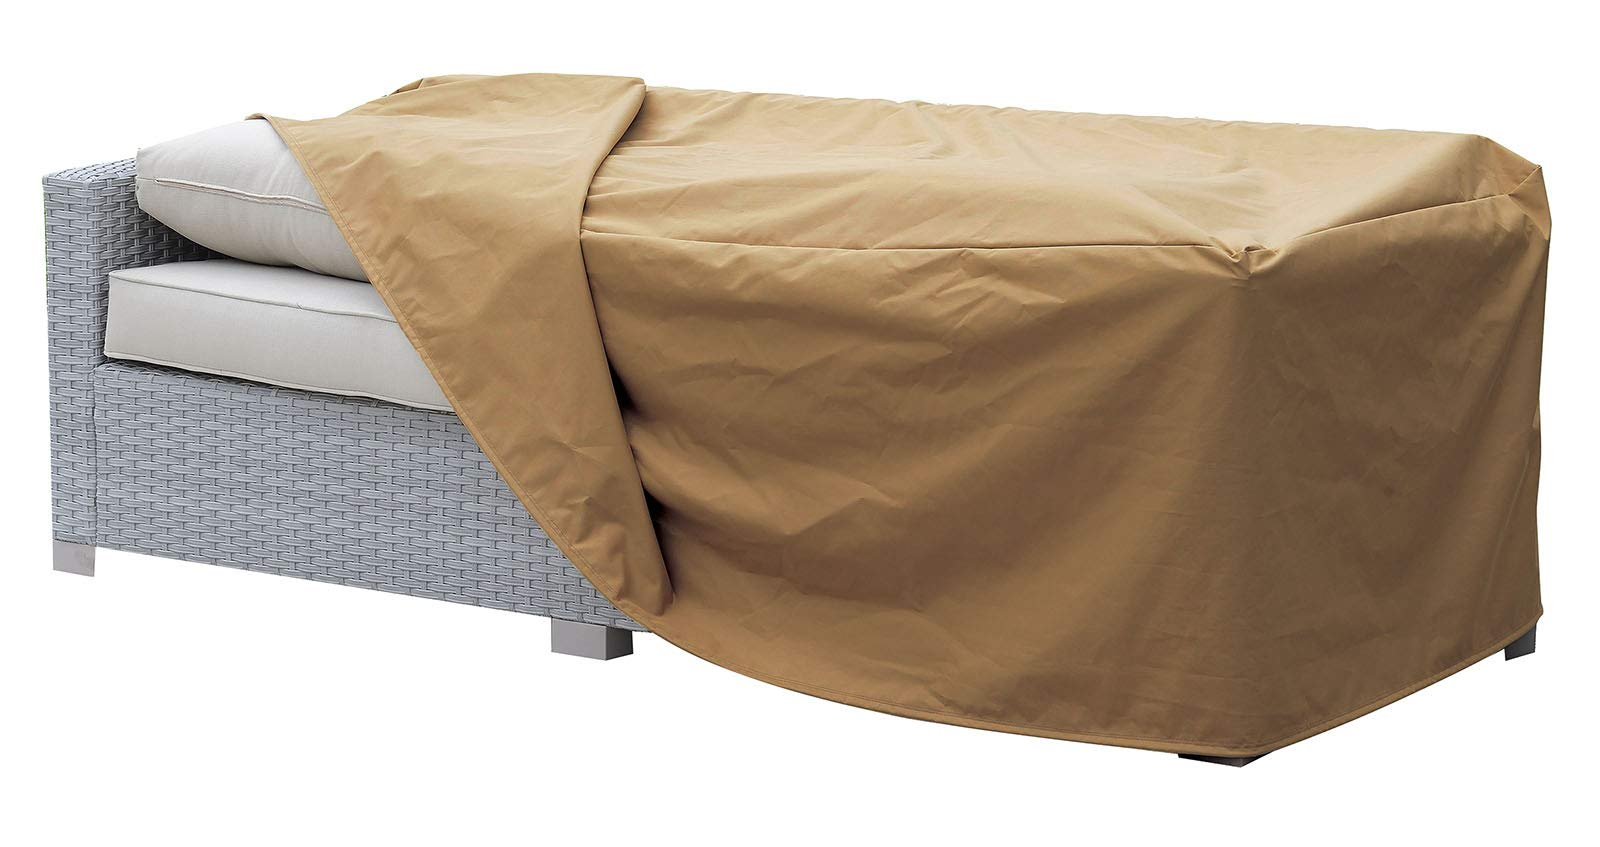 Benzara BM183734 Waterproof Fabric Dust Cover for Outdoor Sofa, Brown